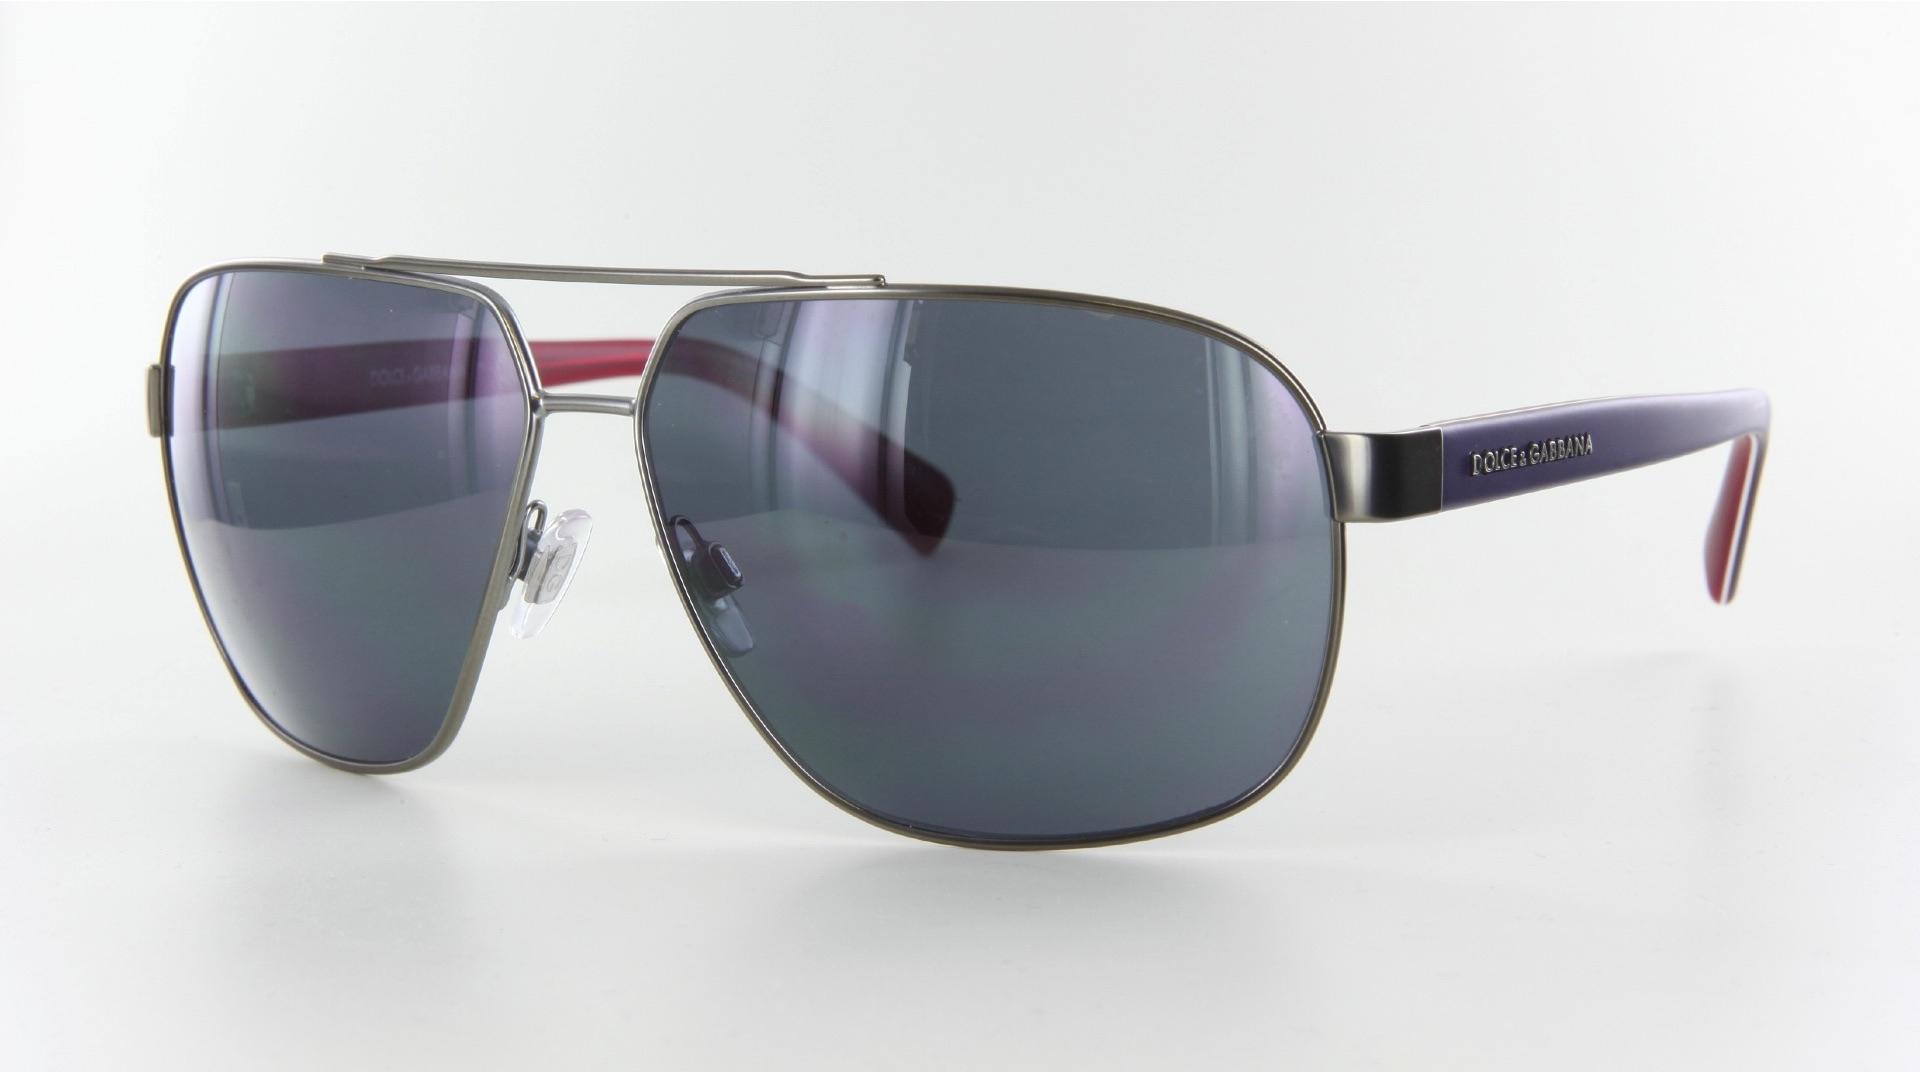 Dolce & Gabbana - ref: 72097